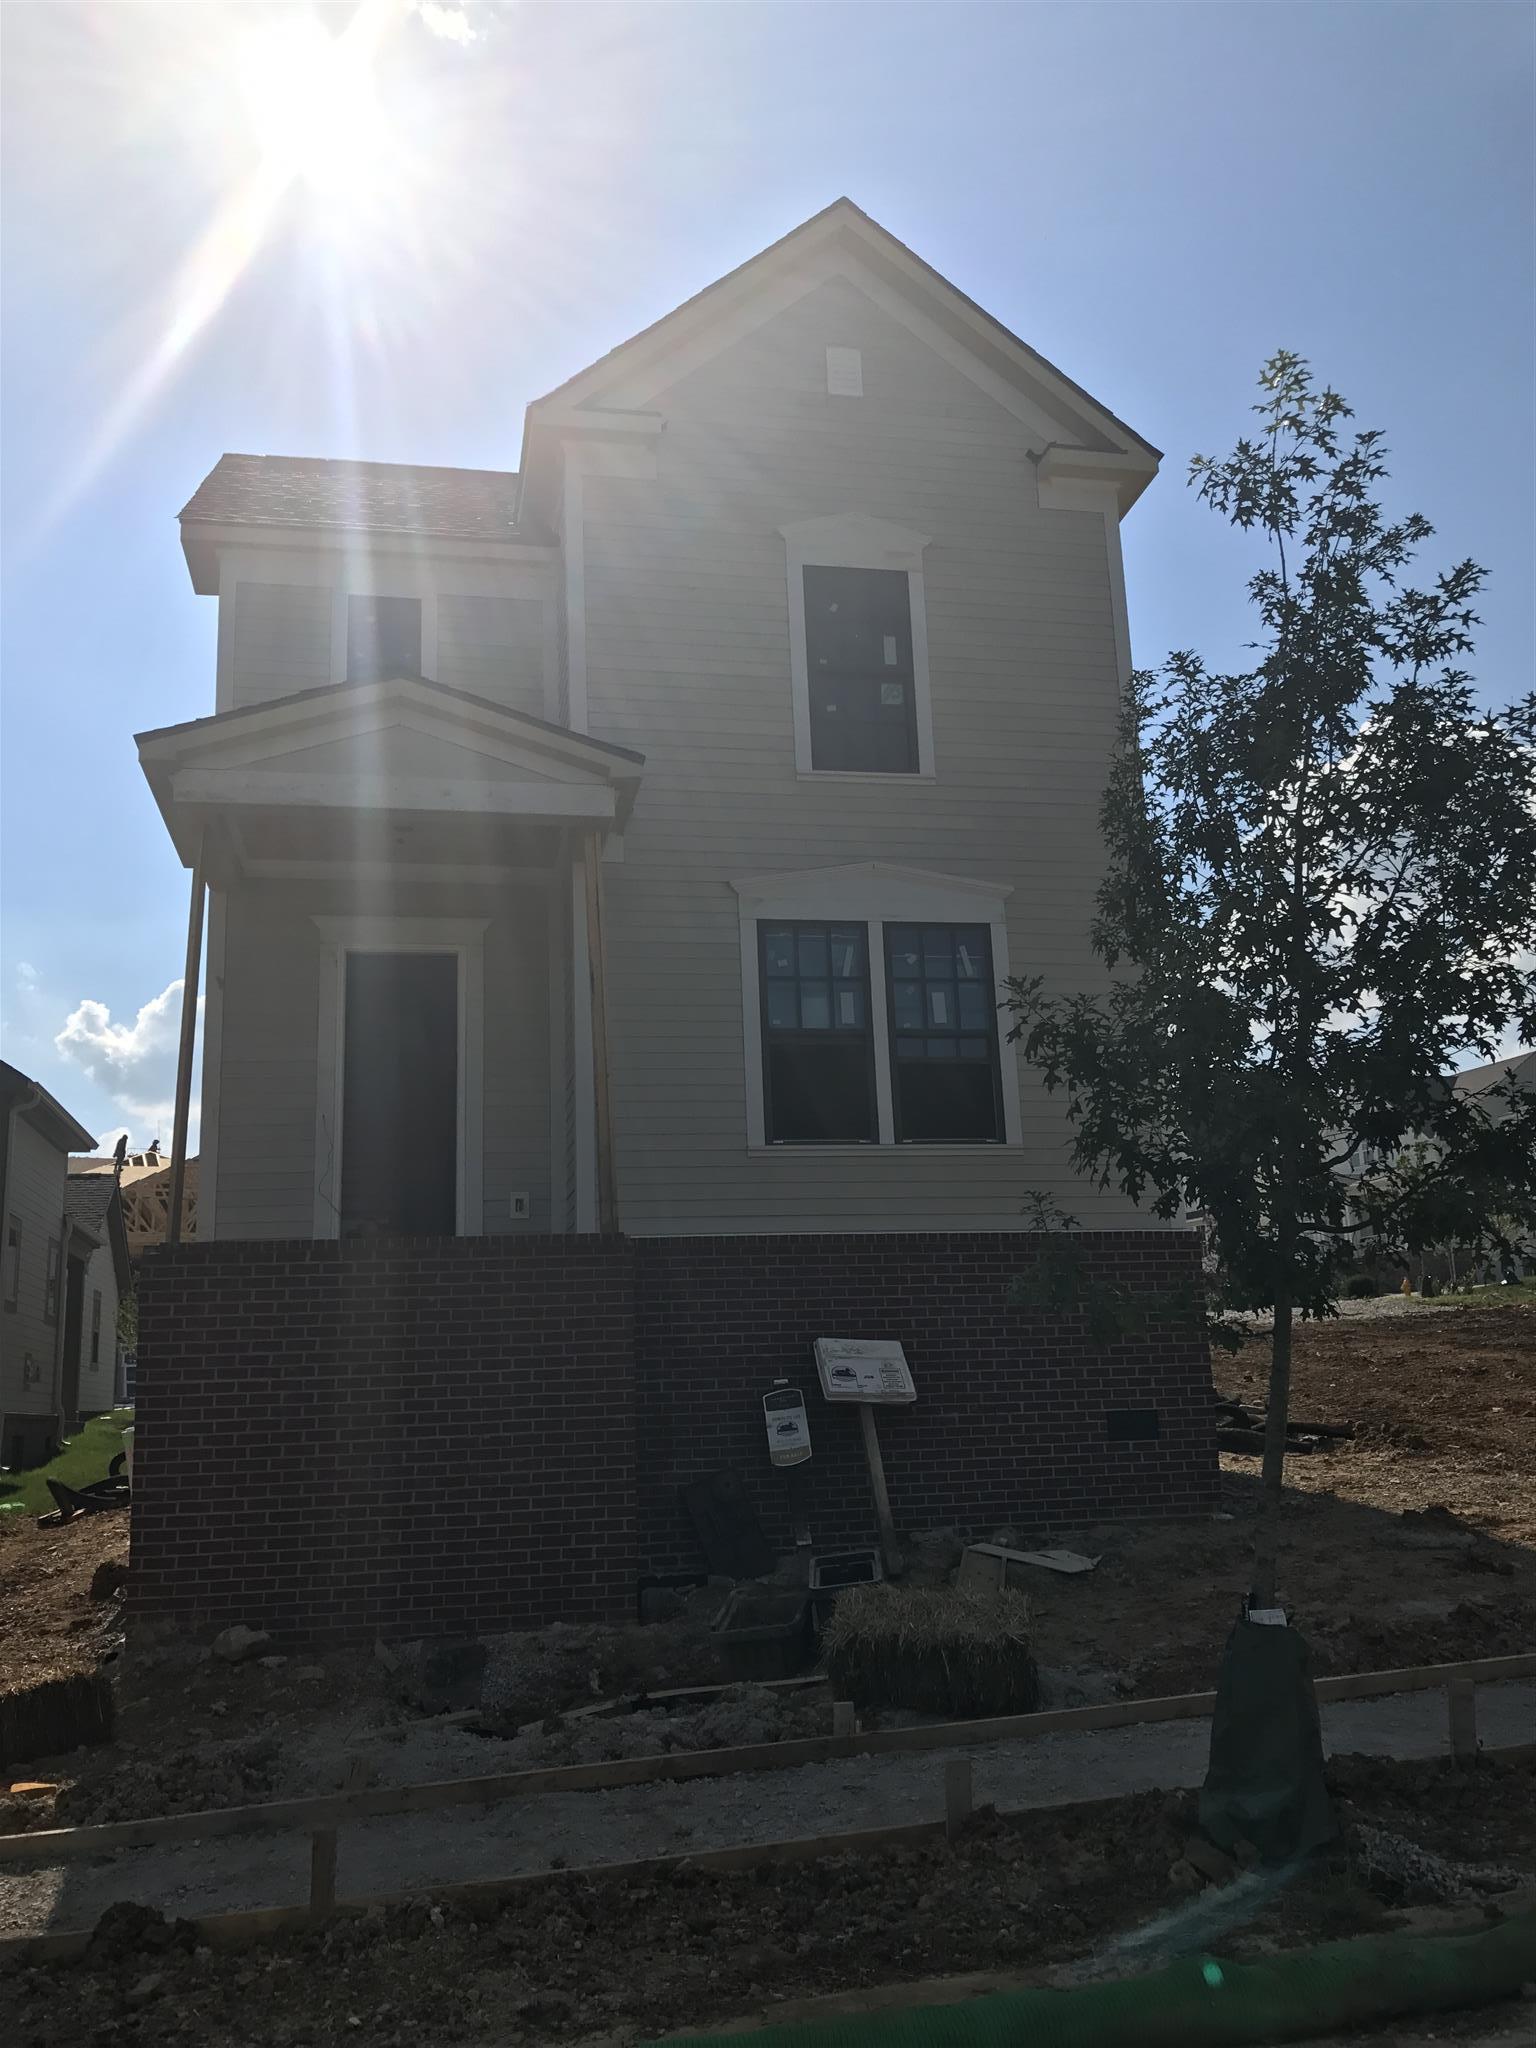 545 Sydenham Drive - Lot 143, Franklin, TN 37064